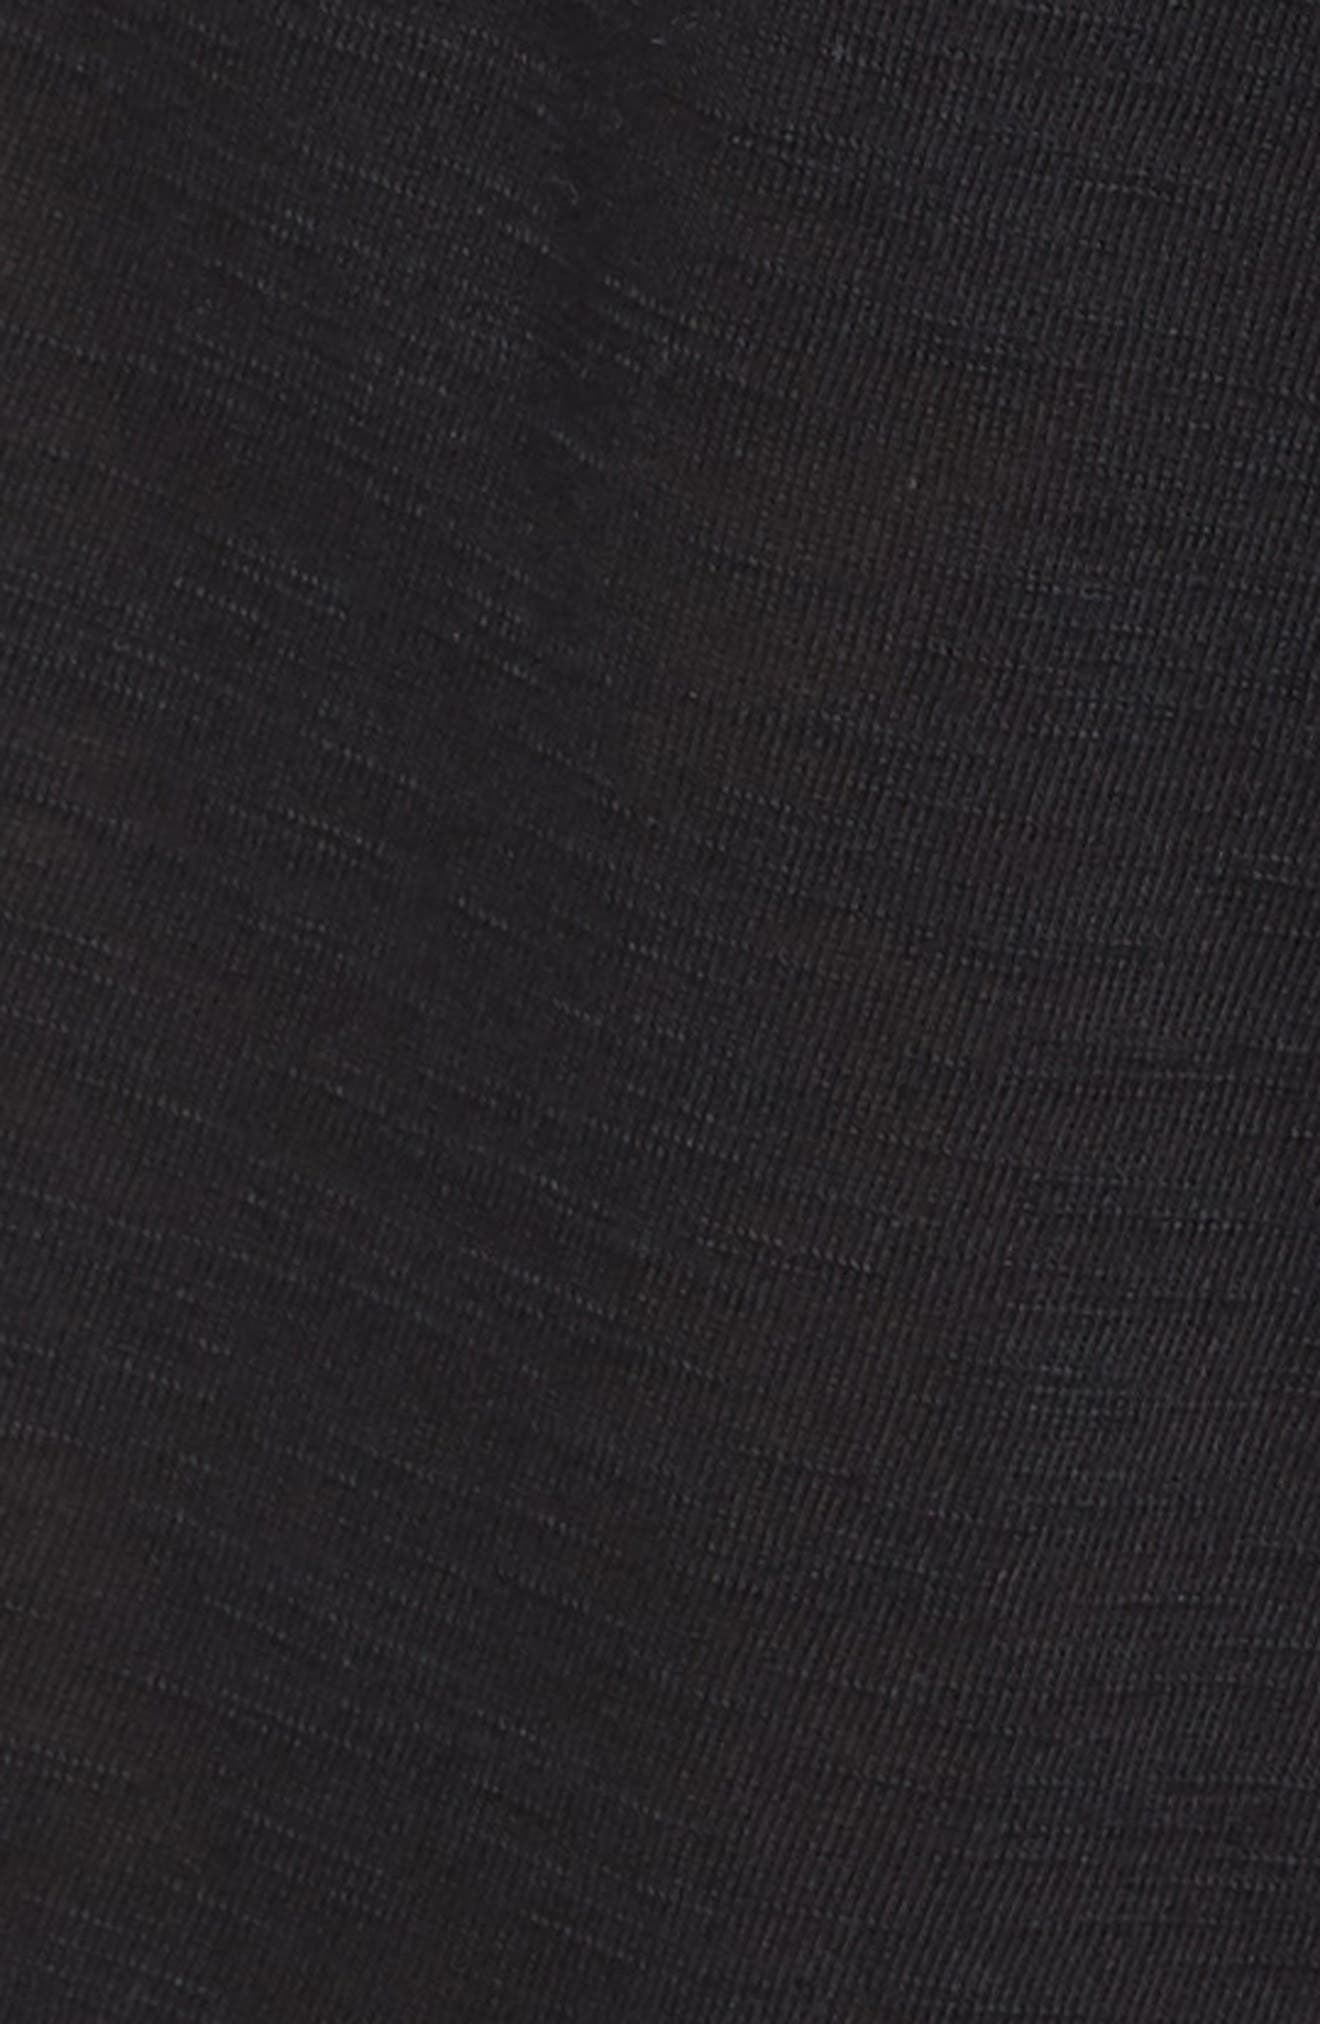 Breezy Basics Jumpsuit,                             Alternate thumbnail 5, color,                             BLACK